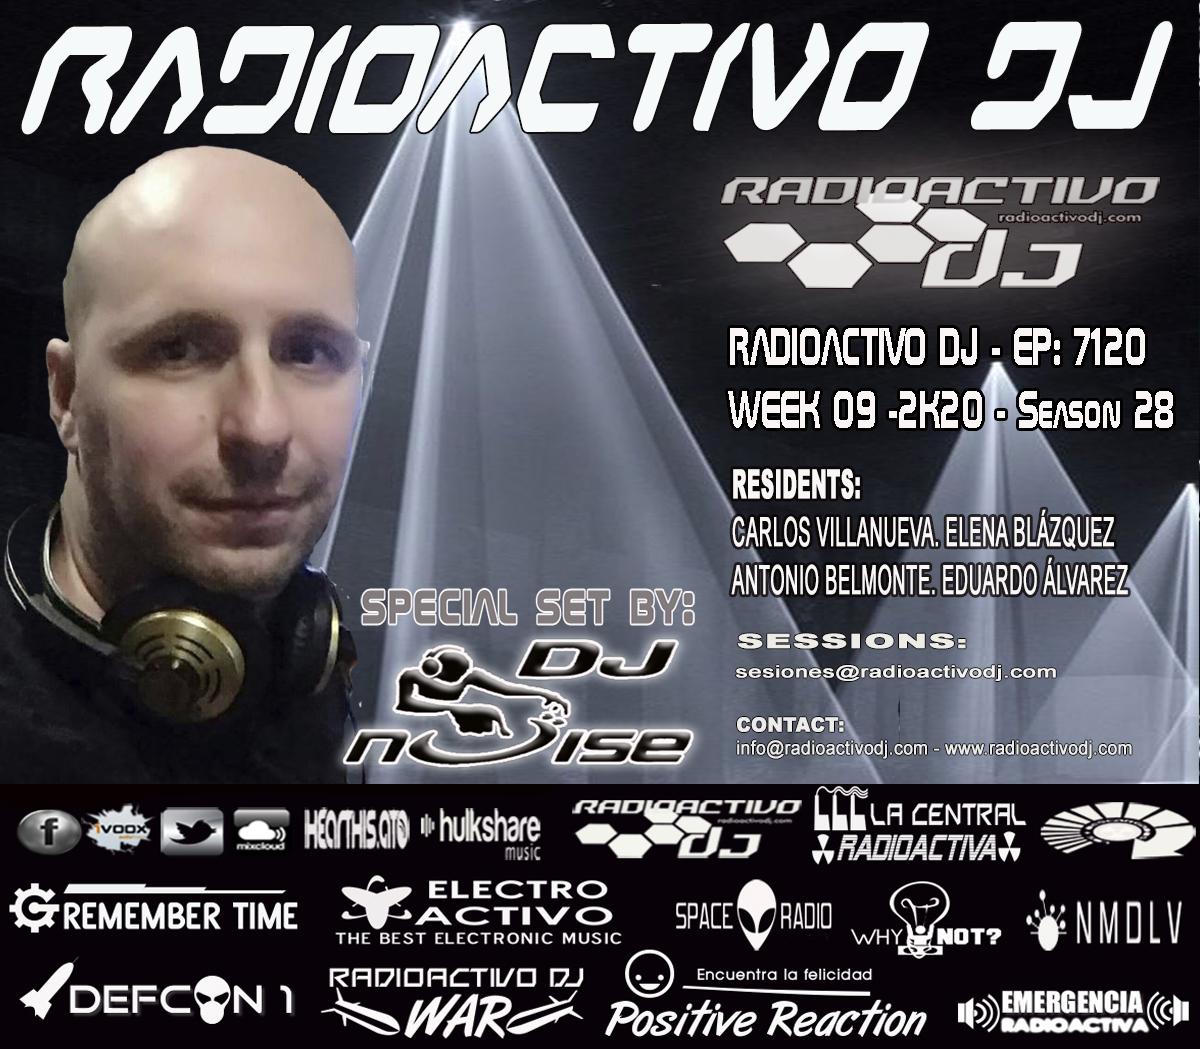 RADIOACTIVO-DJ-09-2020